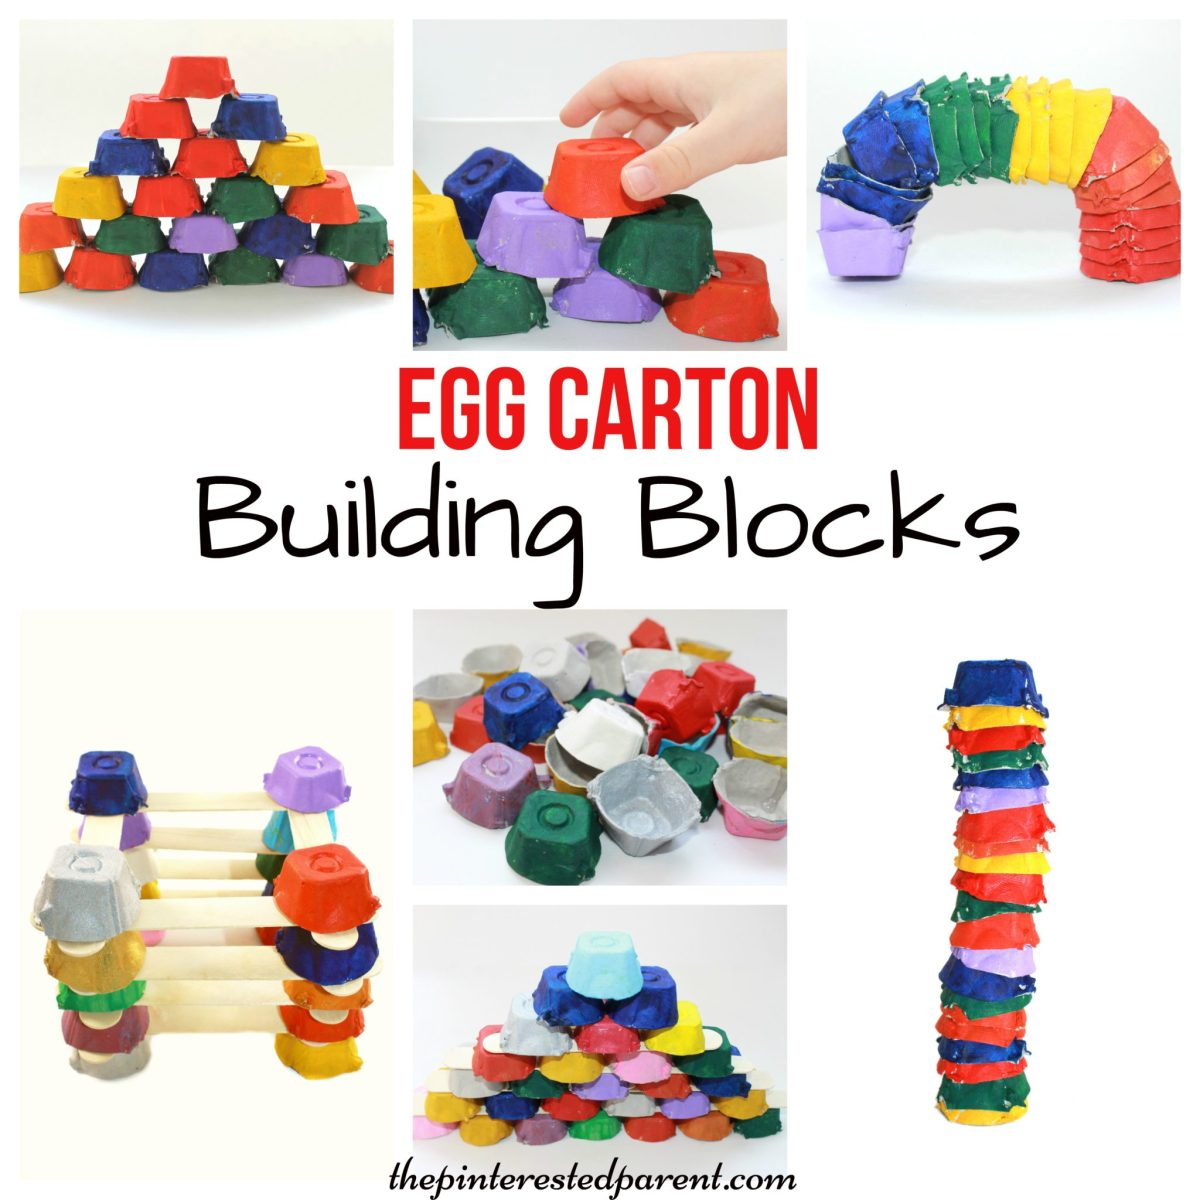 Egg Carton Building Blocks